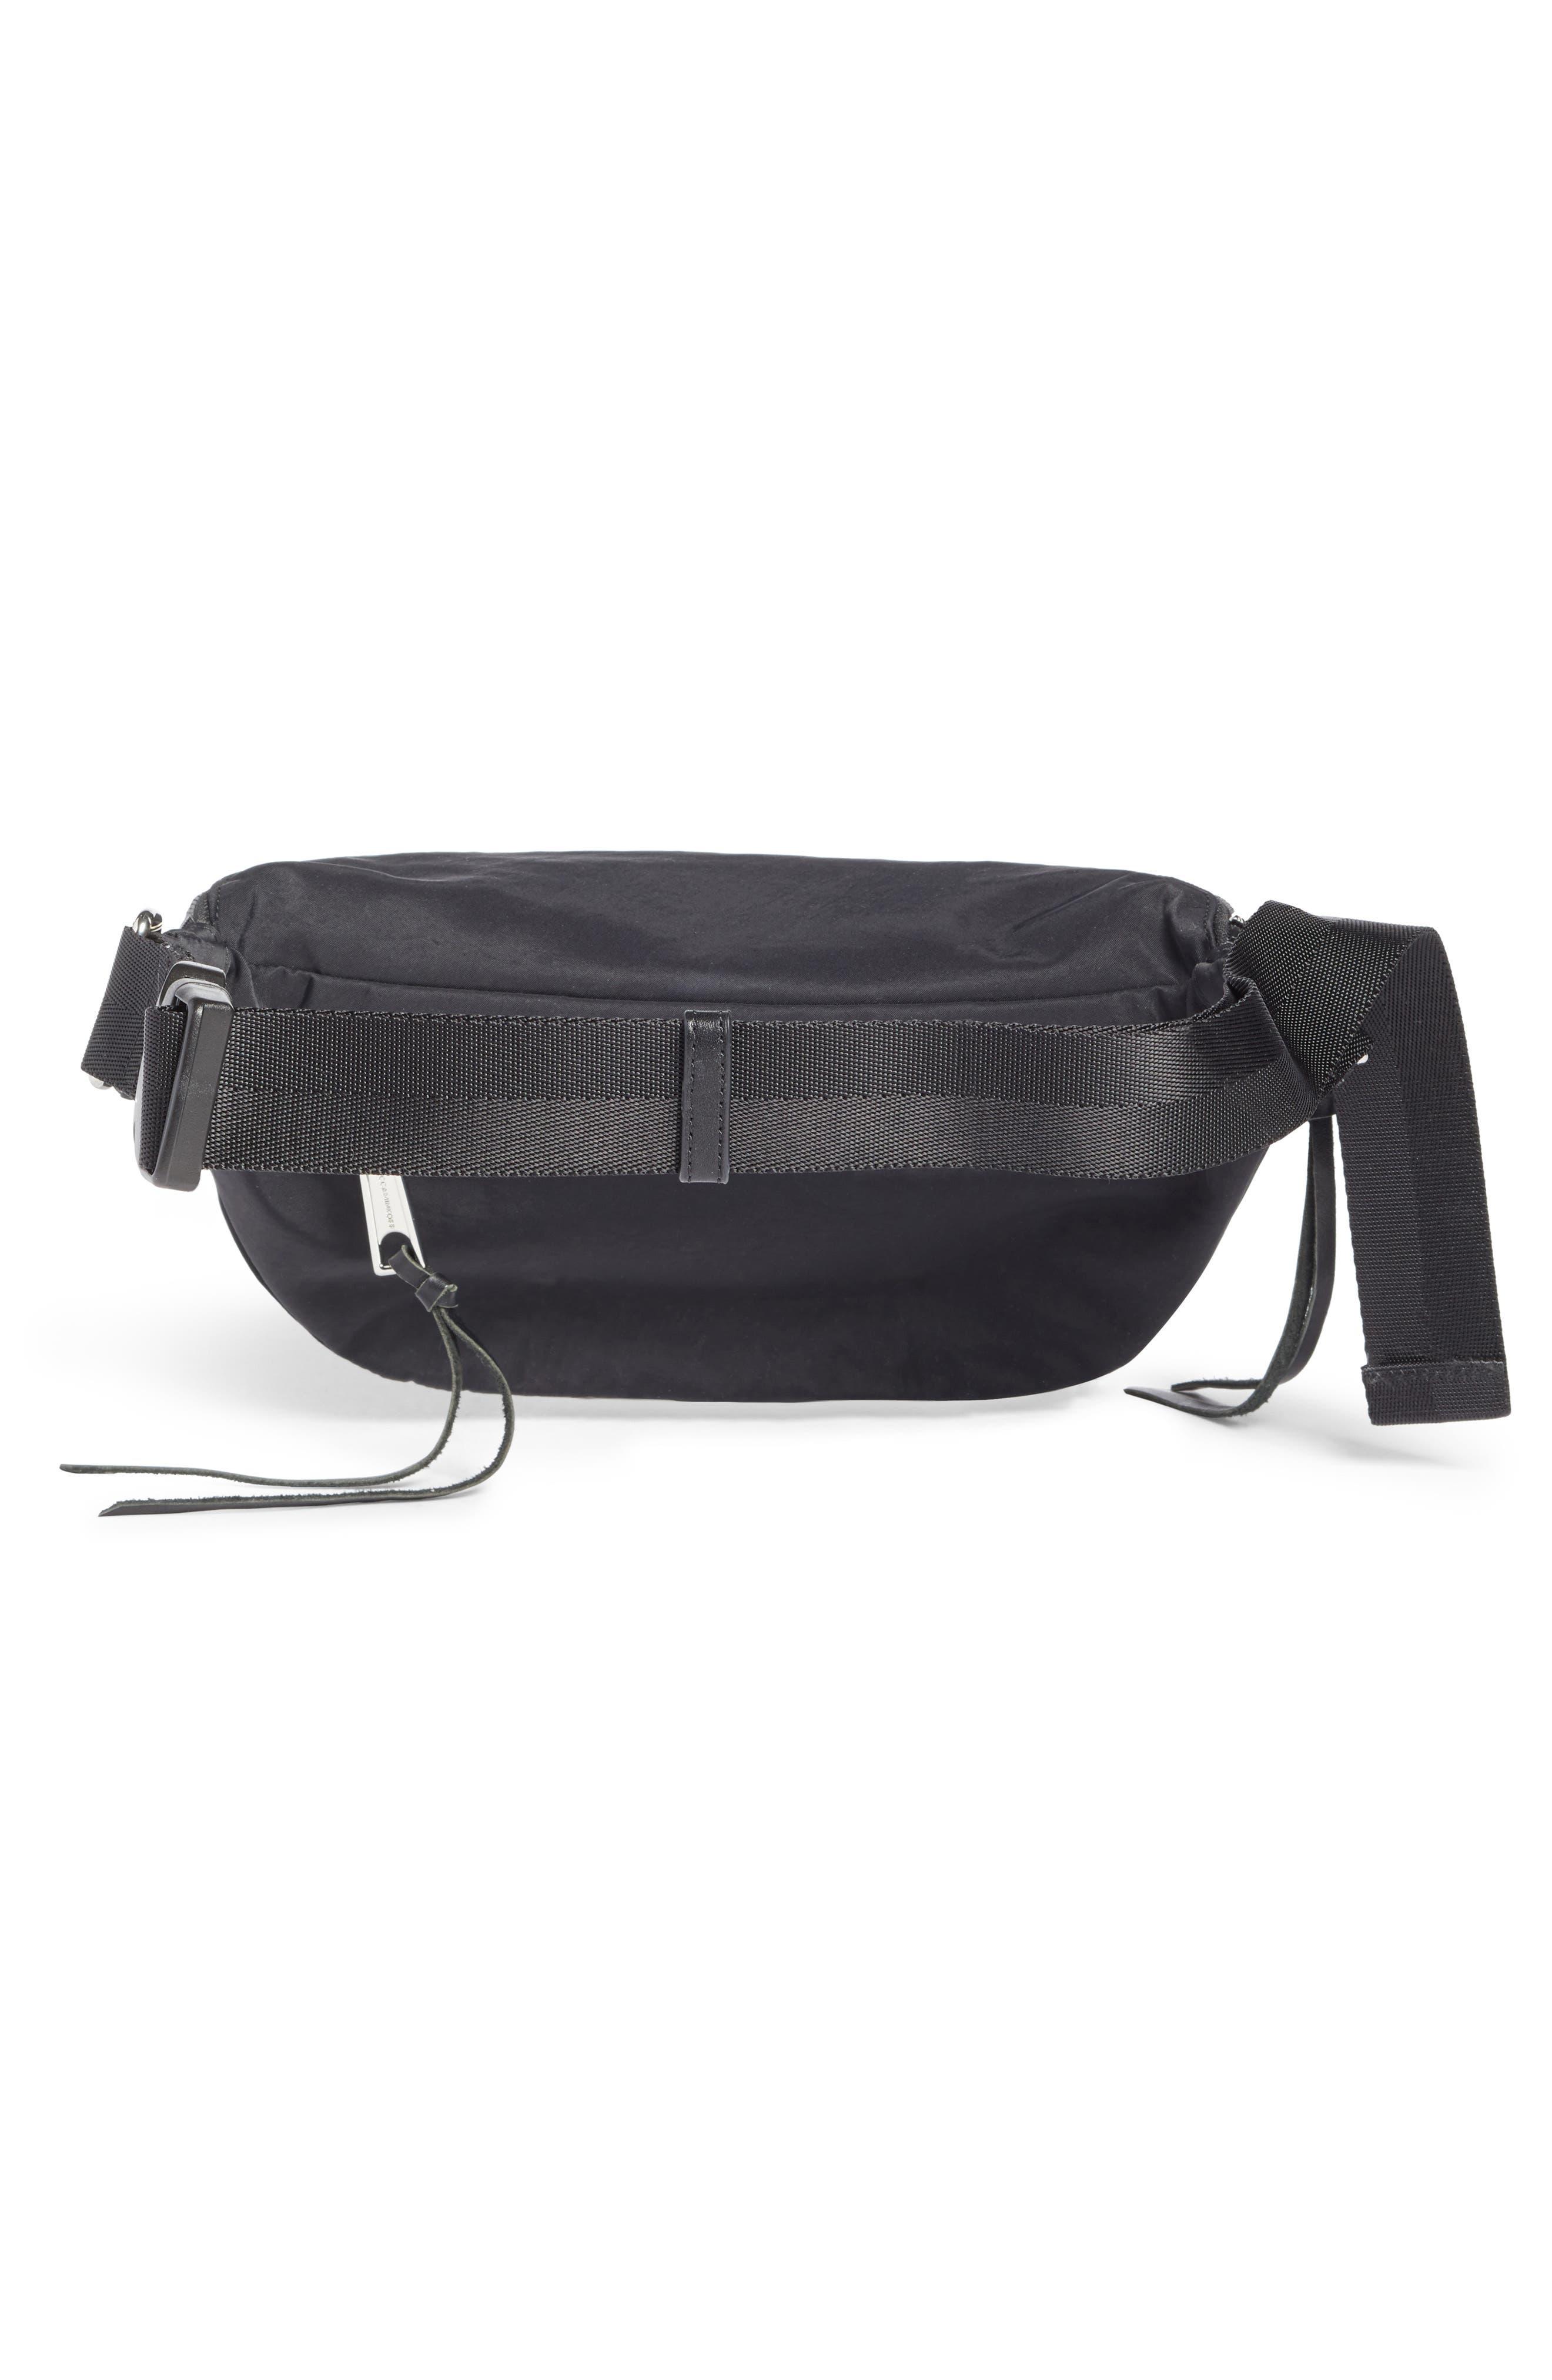 REBECCA MINKOFF, Nylon Belt Bag, Alternate thumbnail 4, color, BLACK